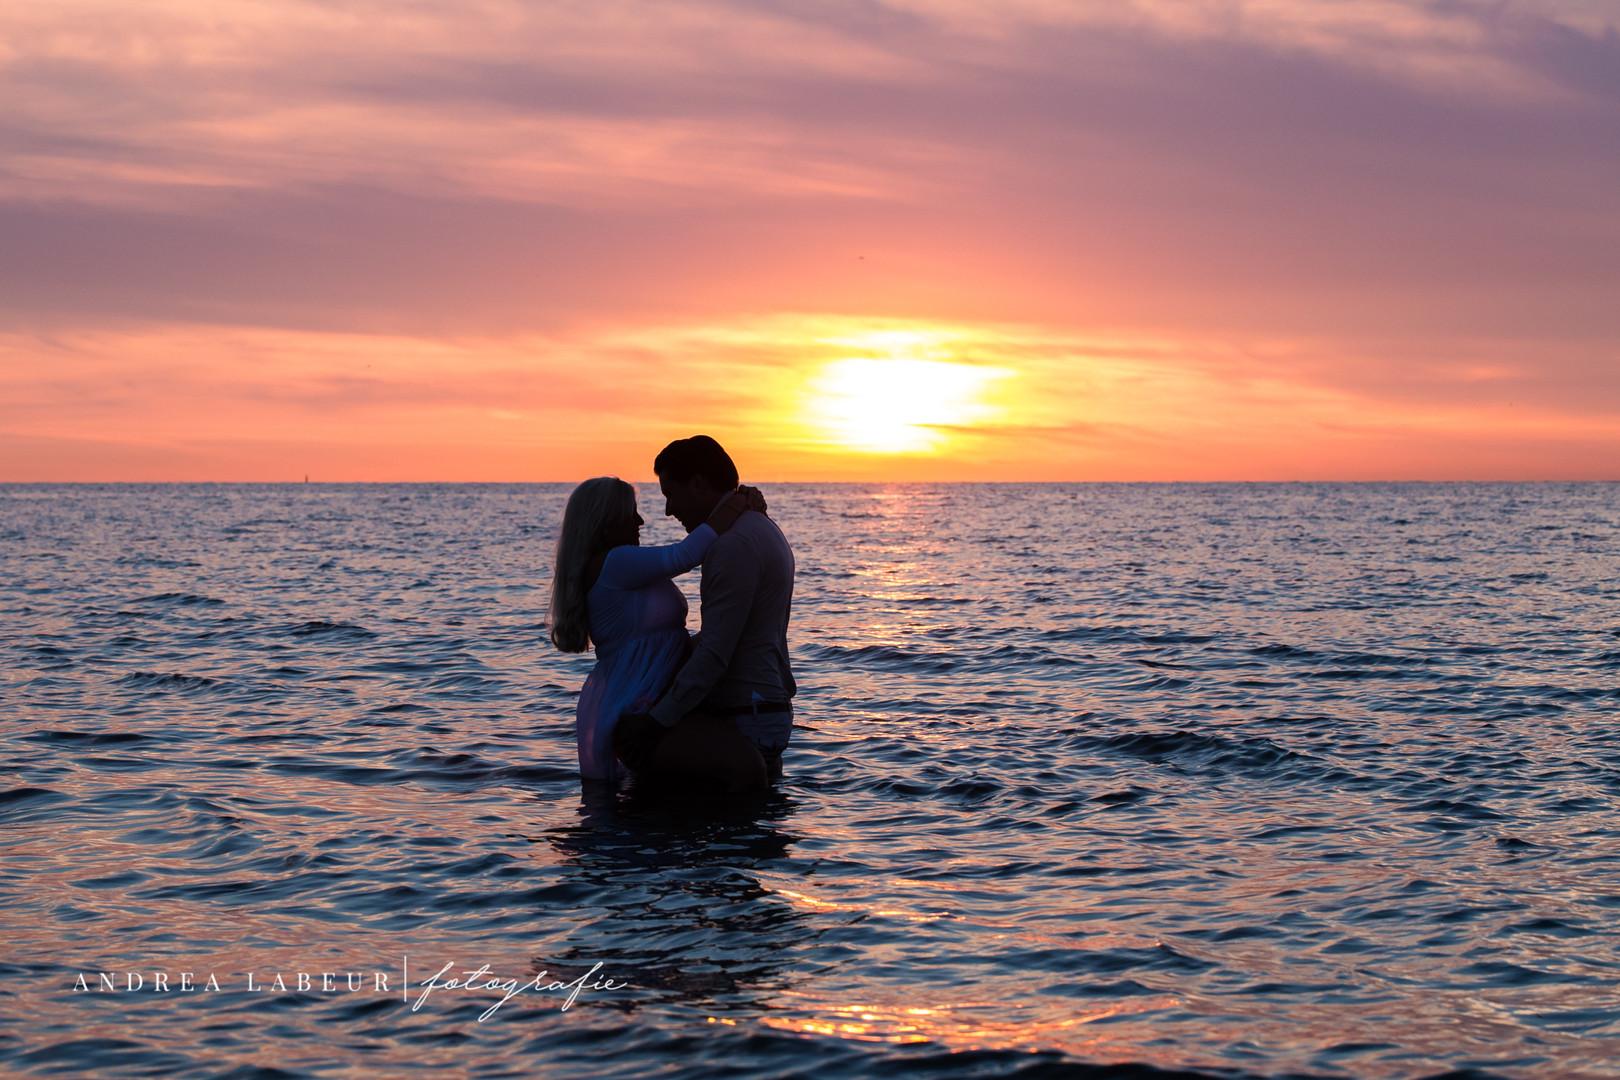 loveshoot op het strand in zeeland